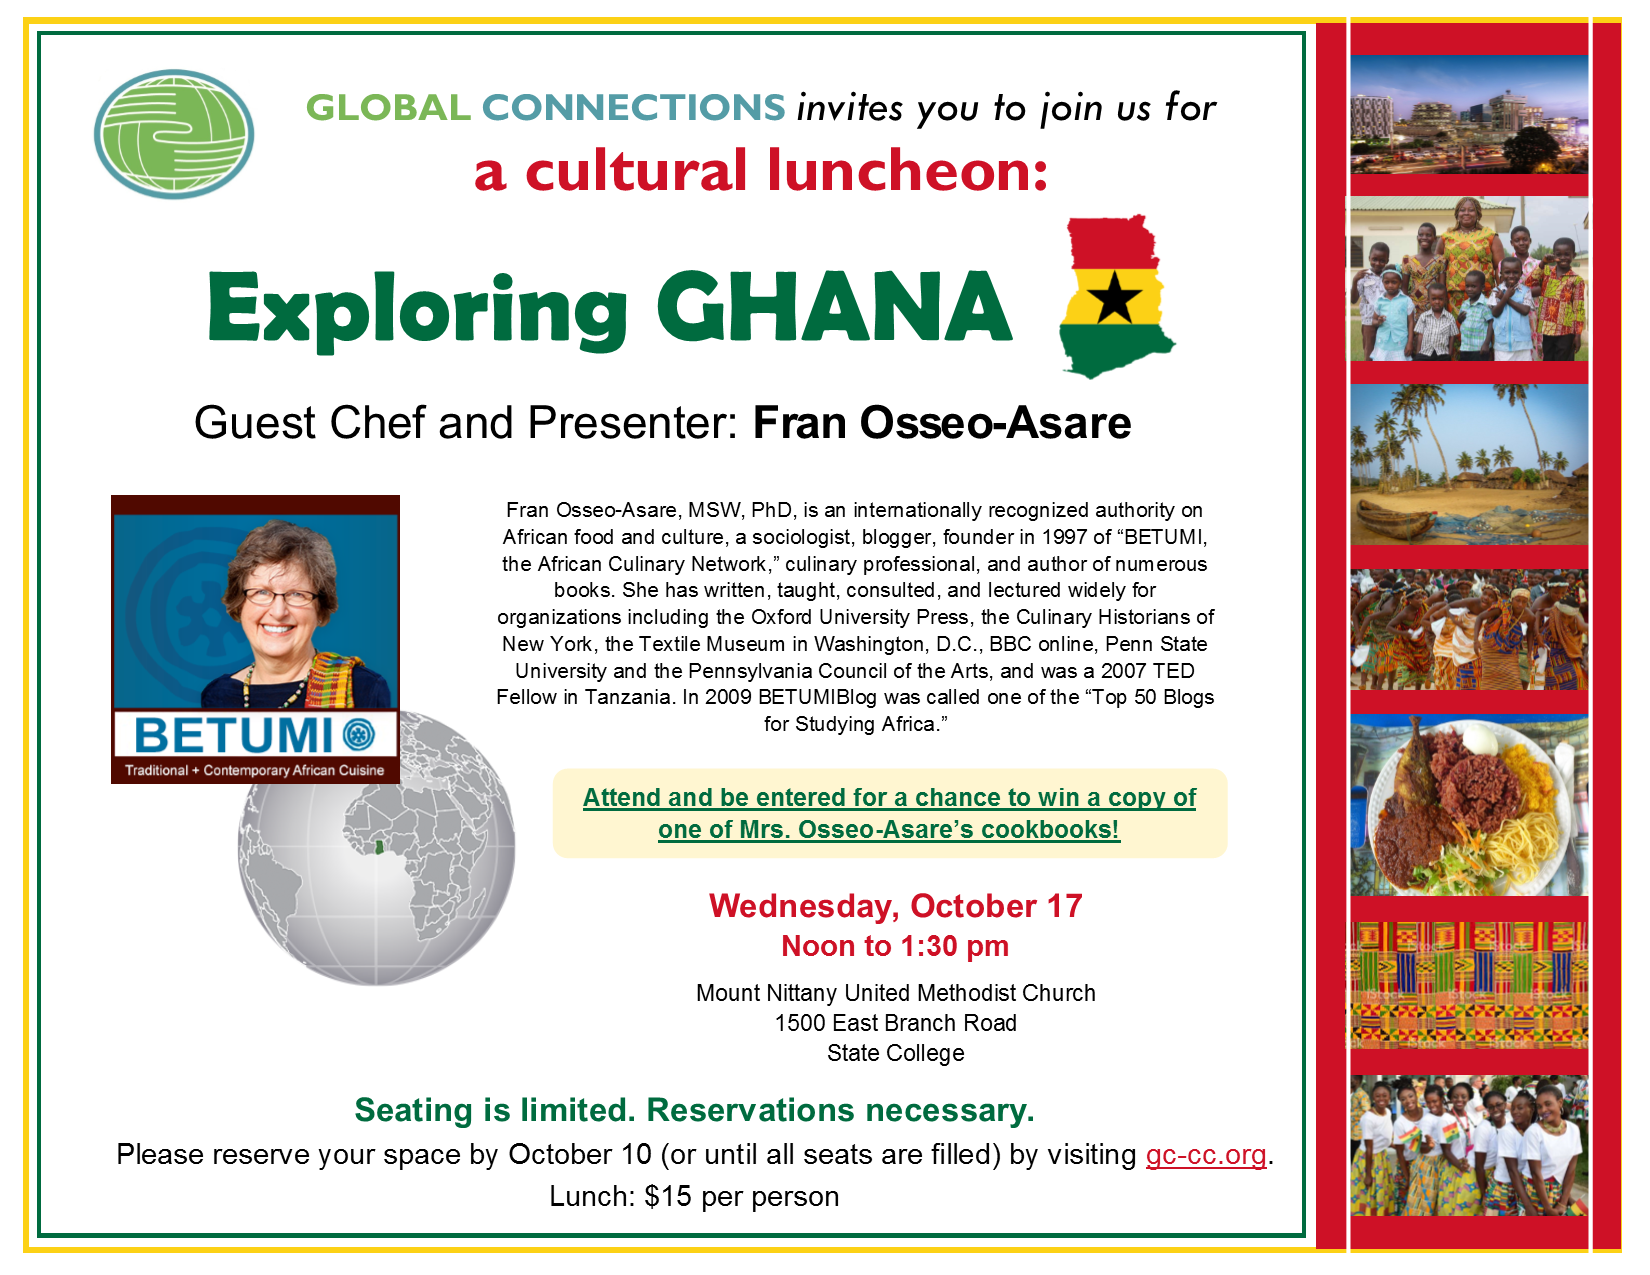 10-17-18 Ghana Flyer updated